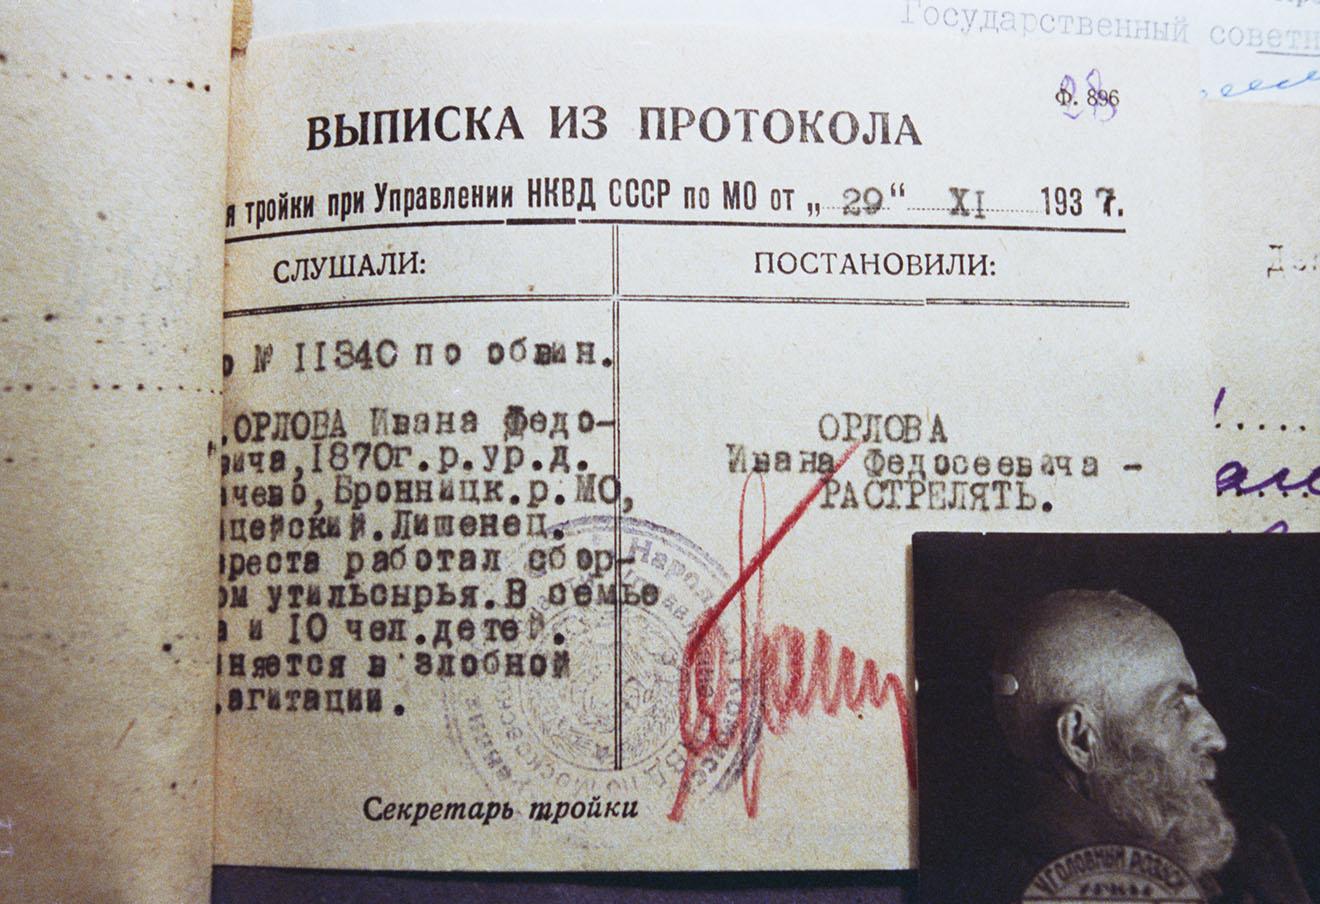 Фото: Малышев Николай / Фотохроника ТАСС